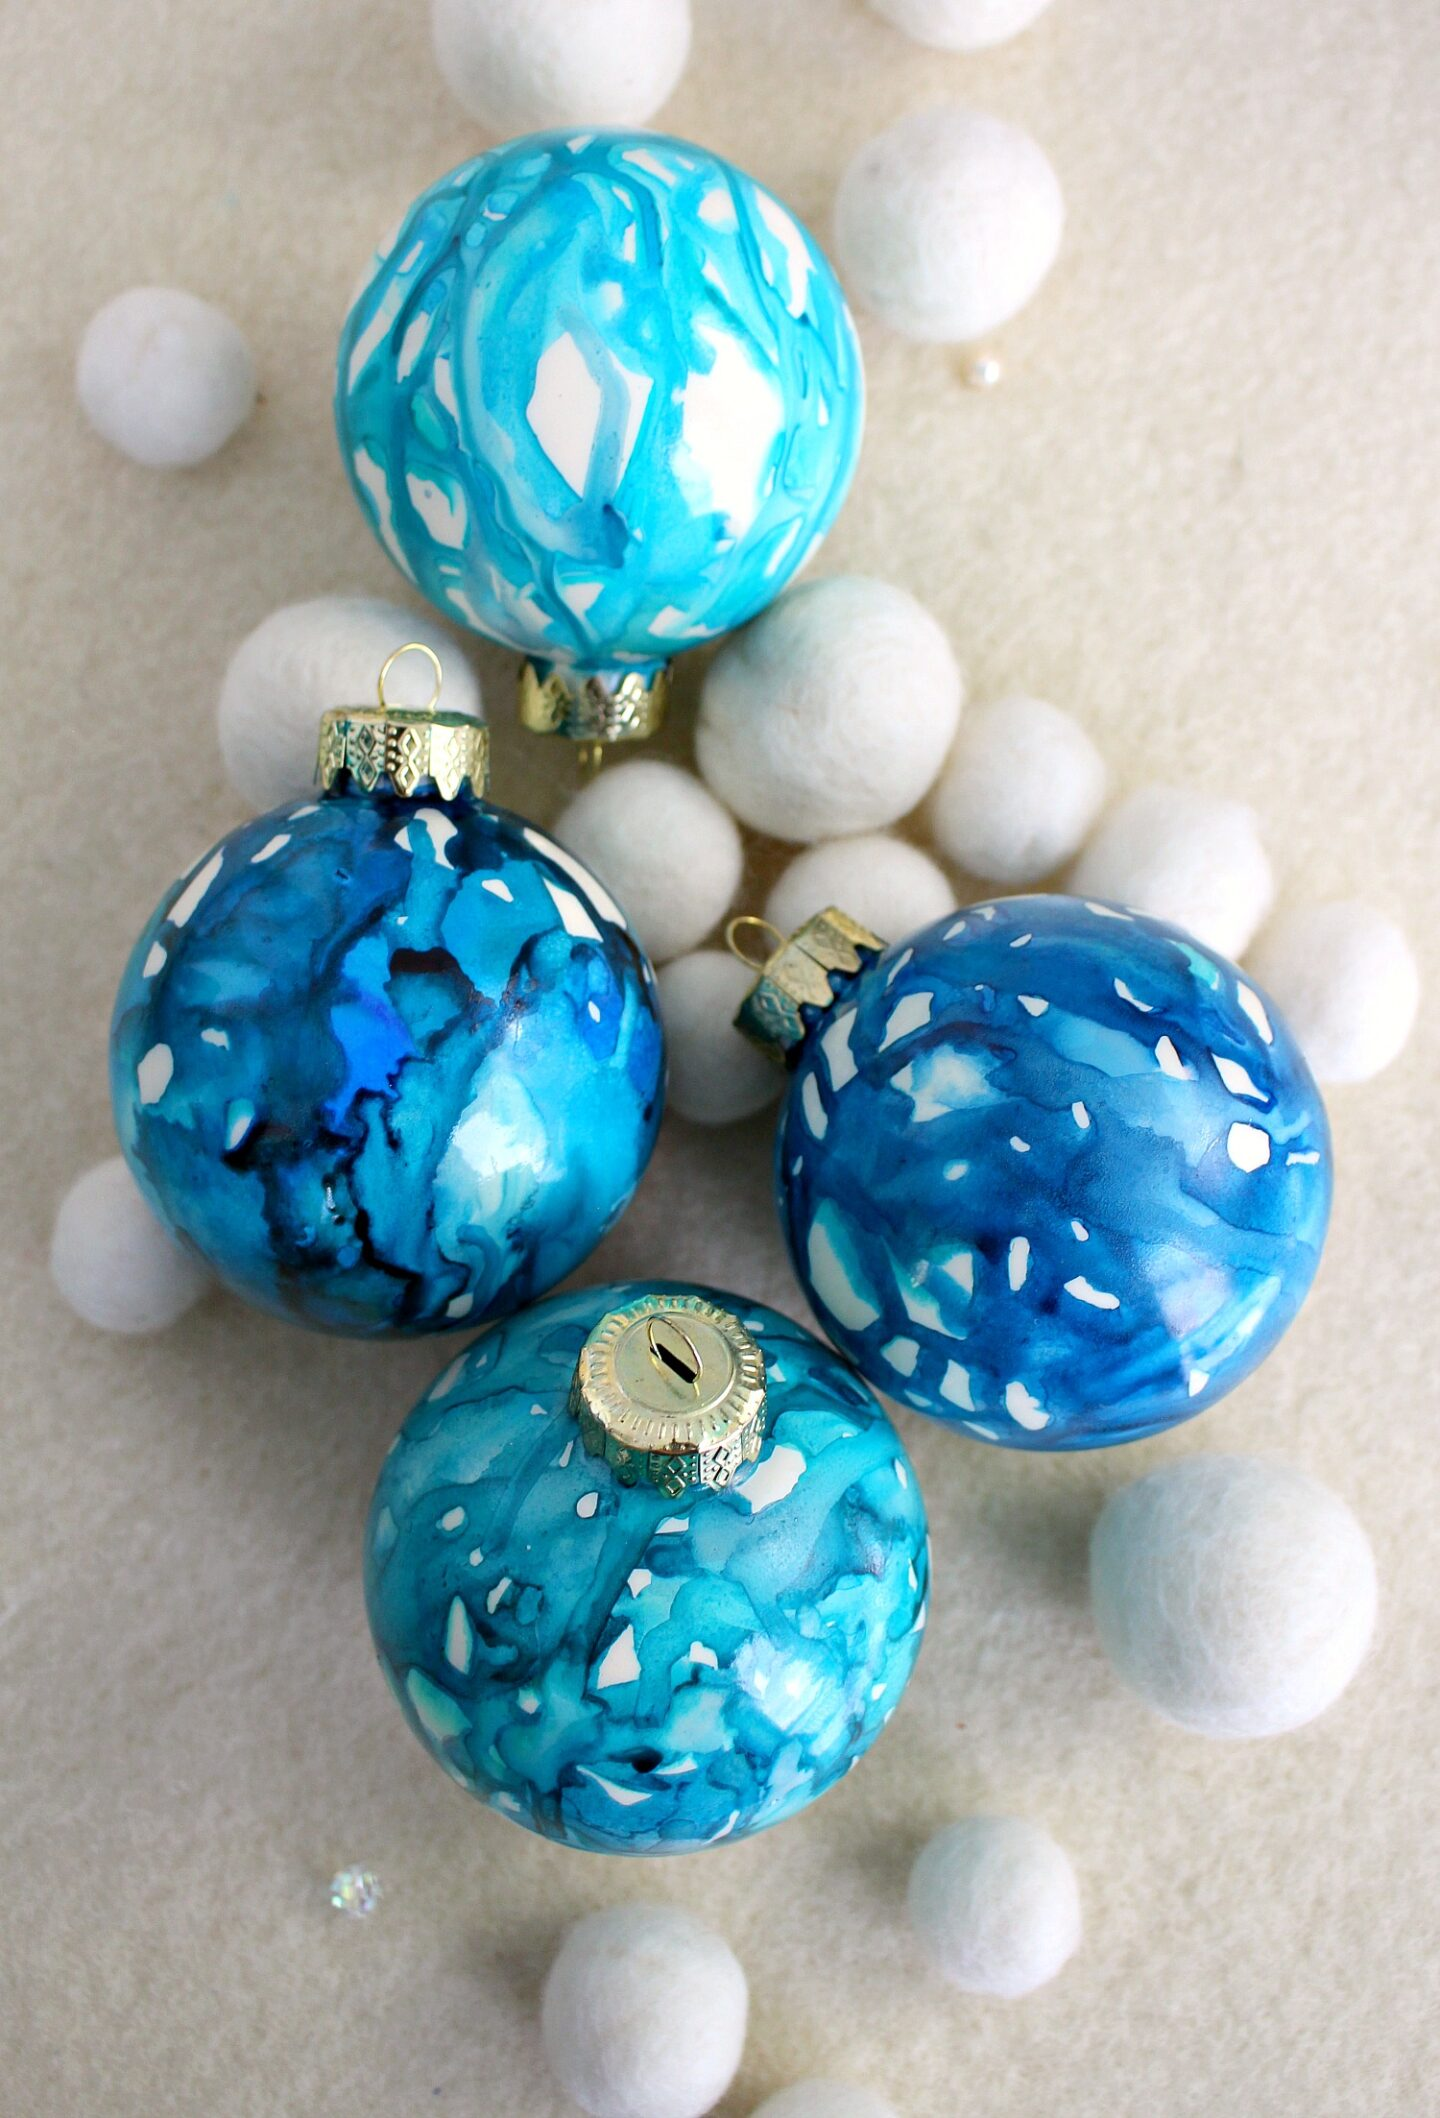 DIY Marbled Christmas Ornament Tutorial